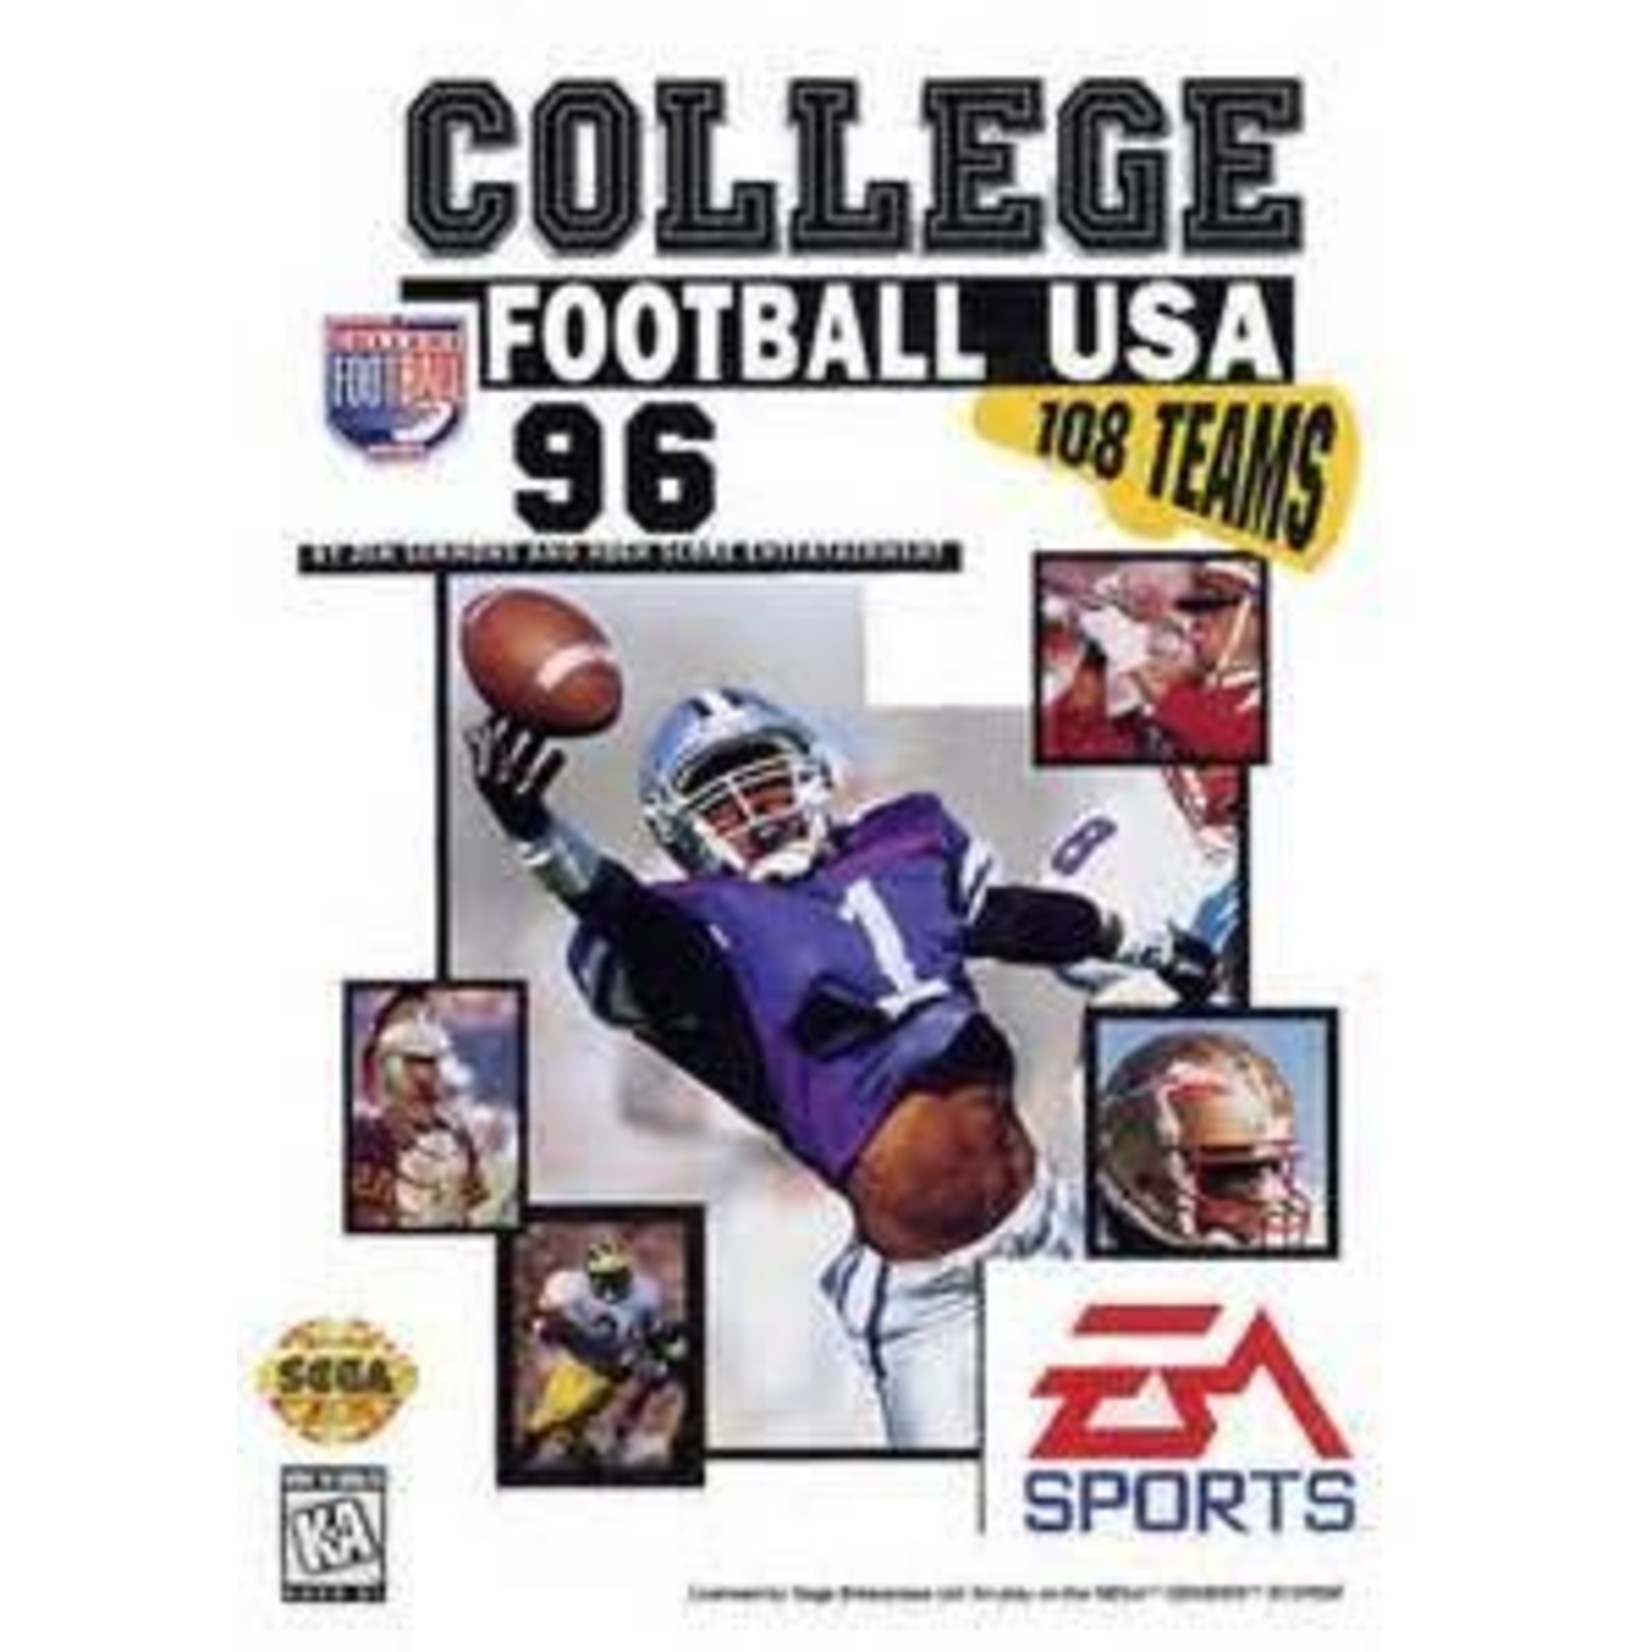 sgu-College Football USA 96 (inbox)